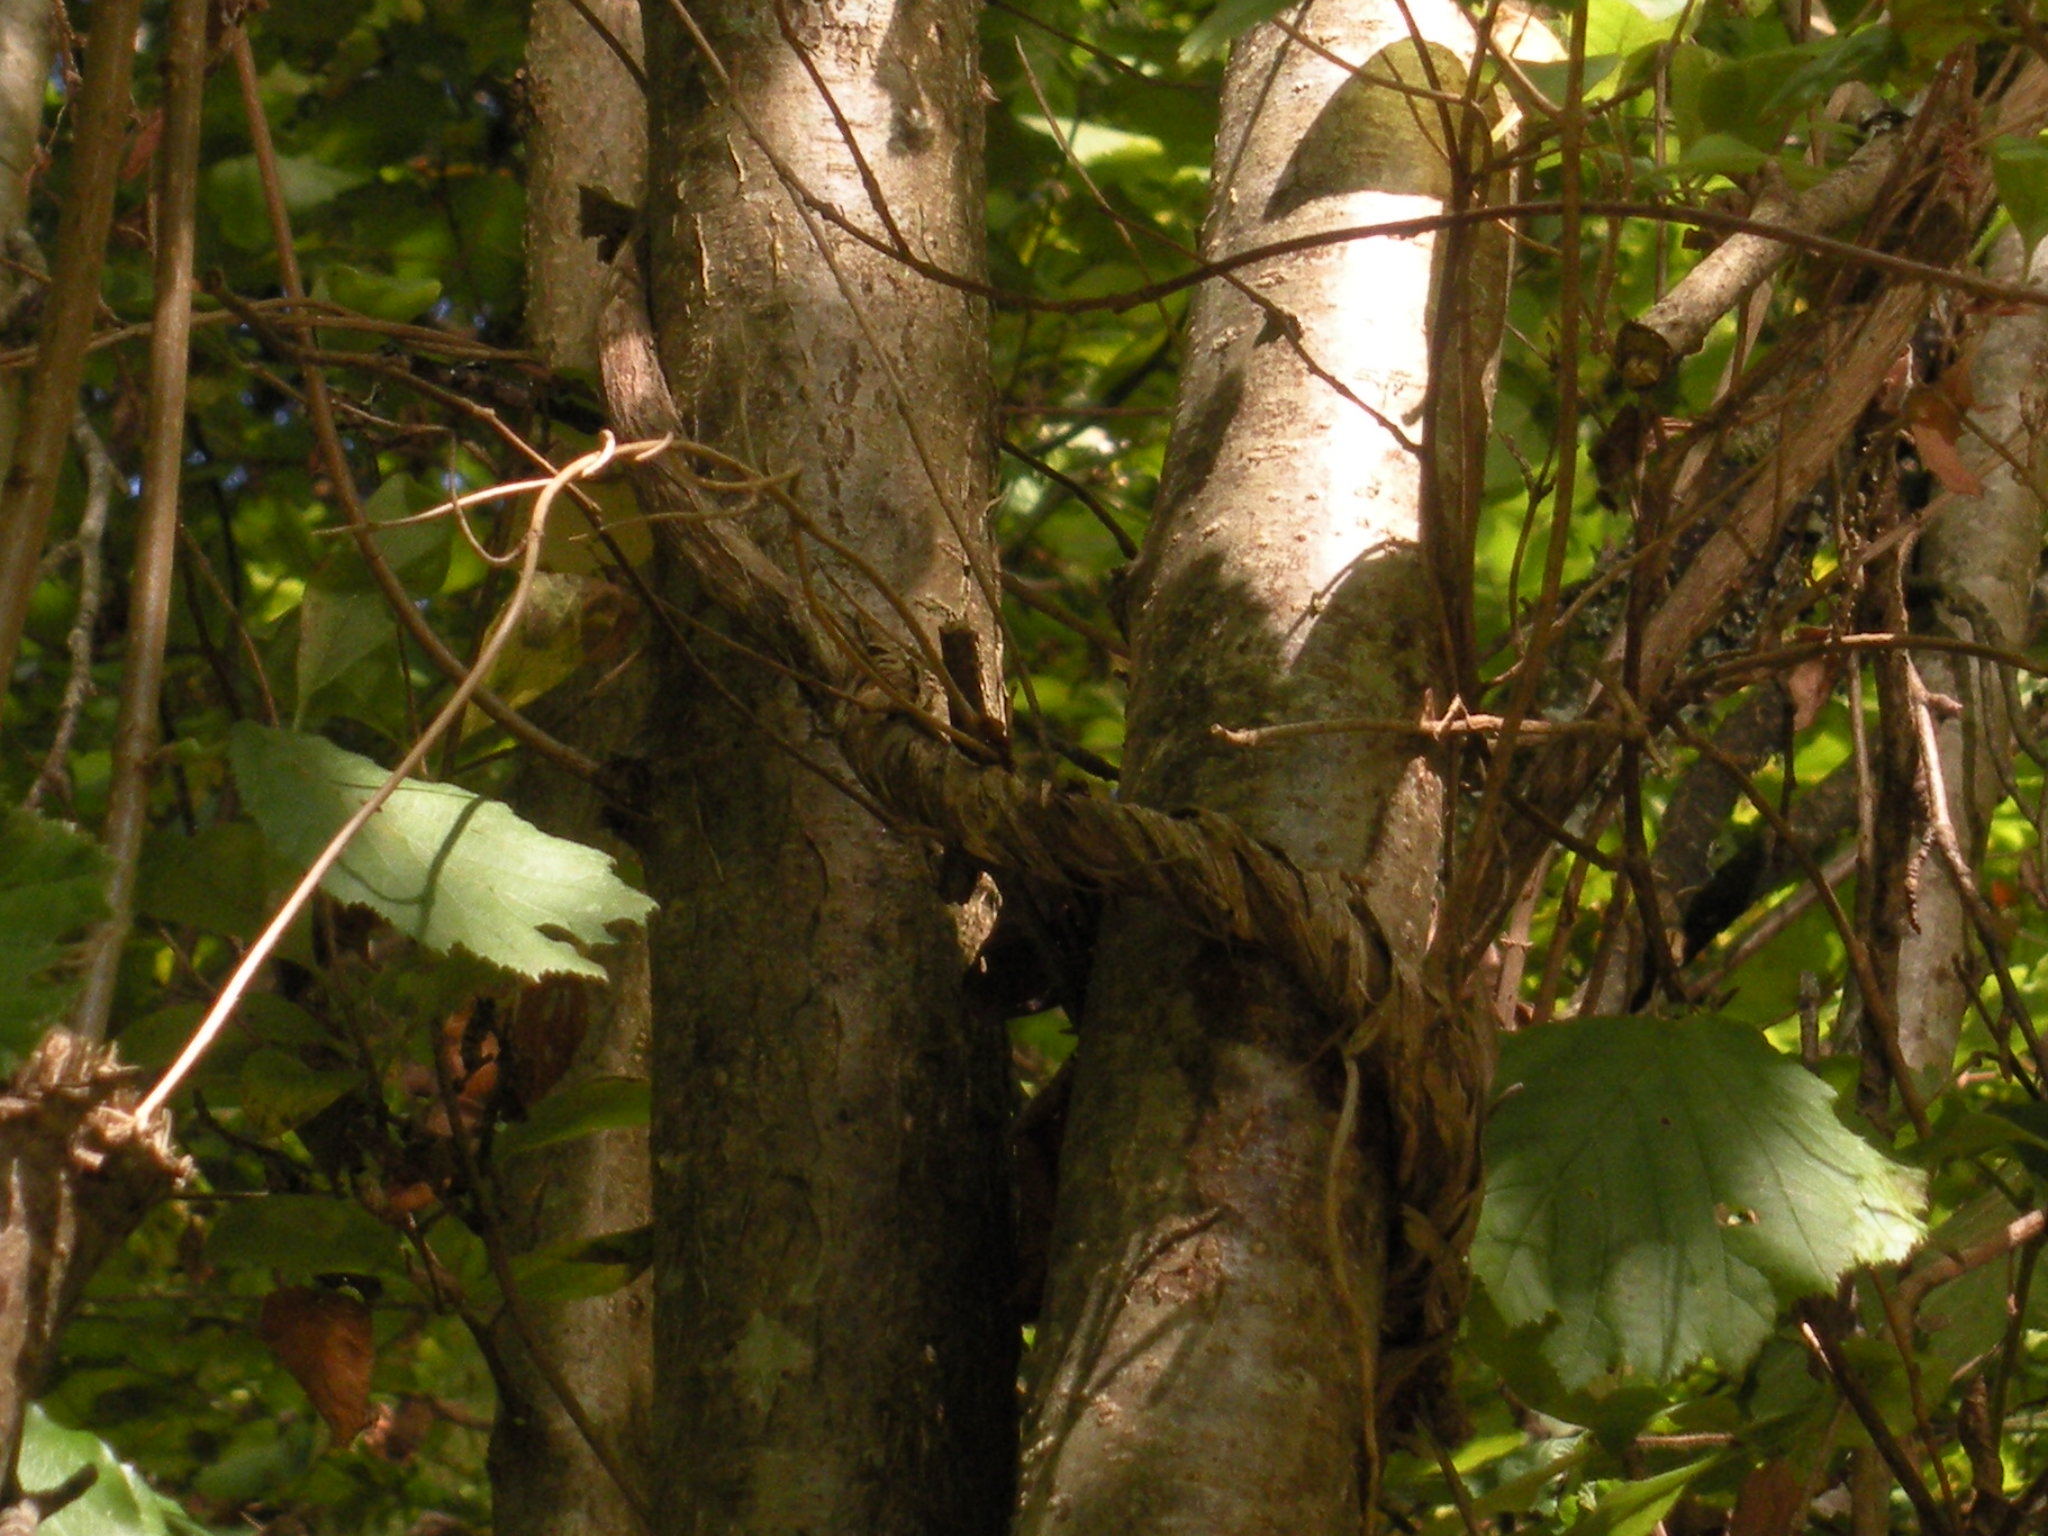 arbres enlacés